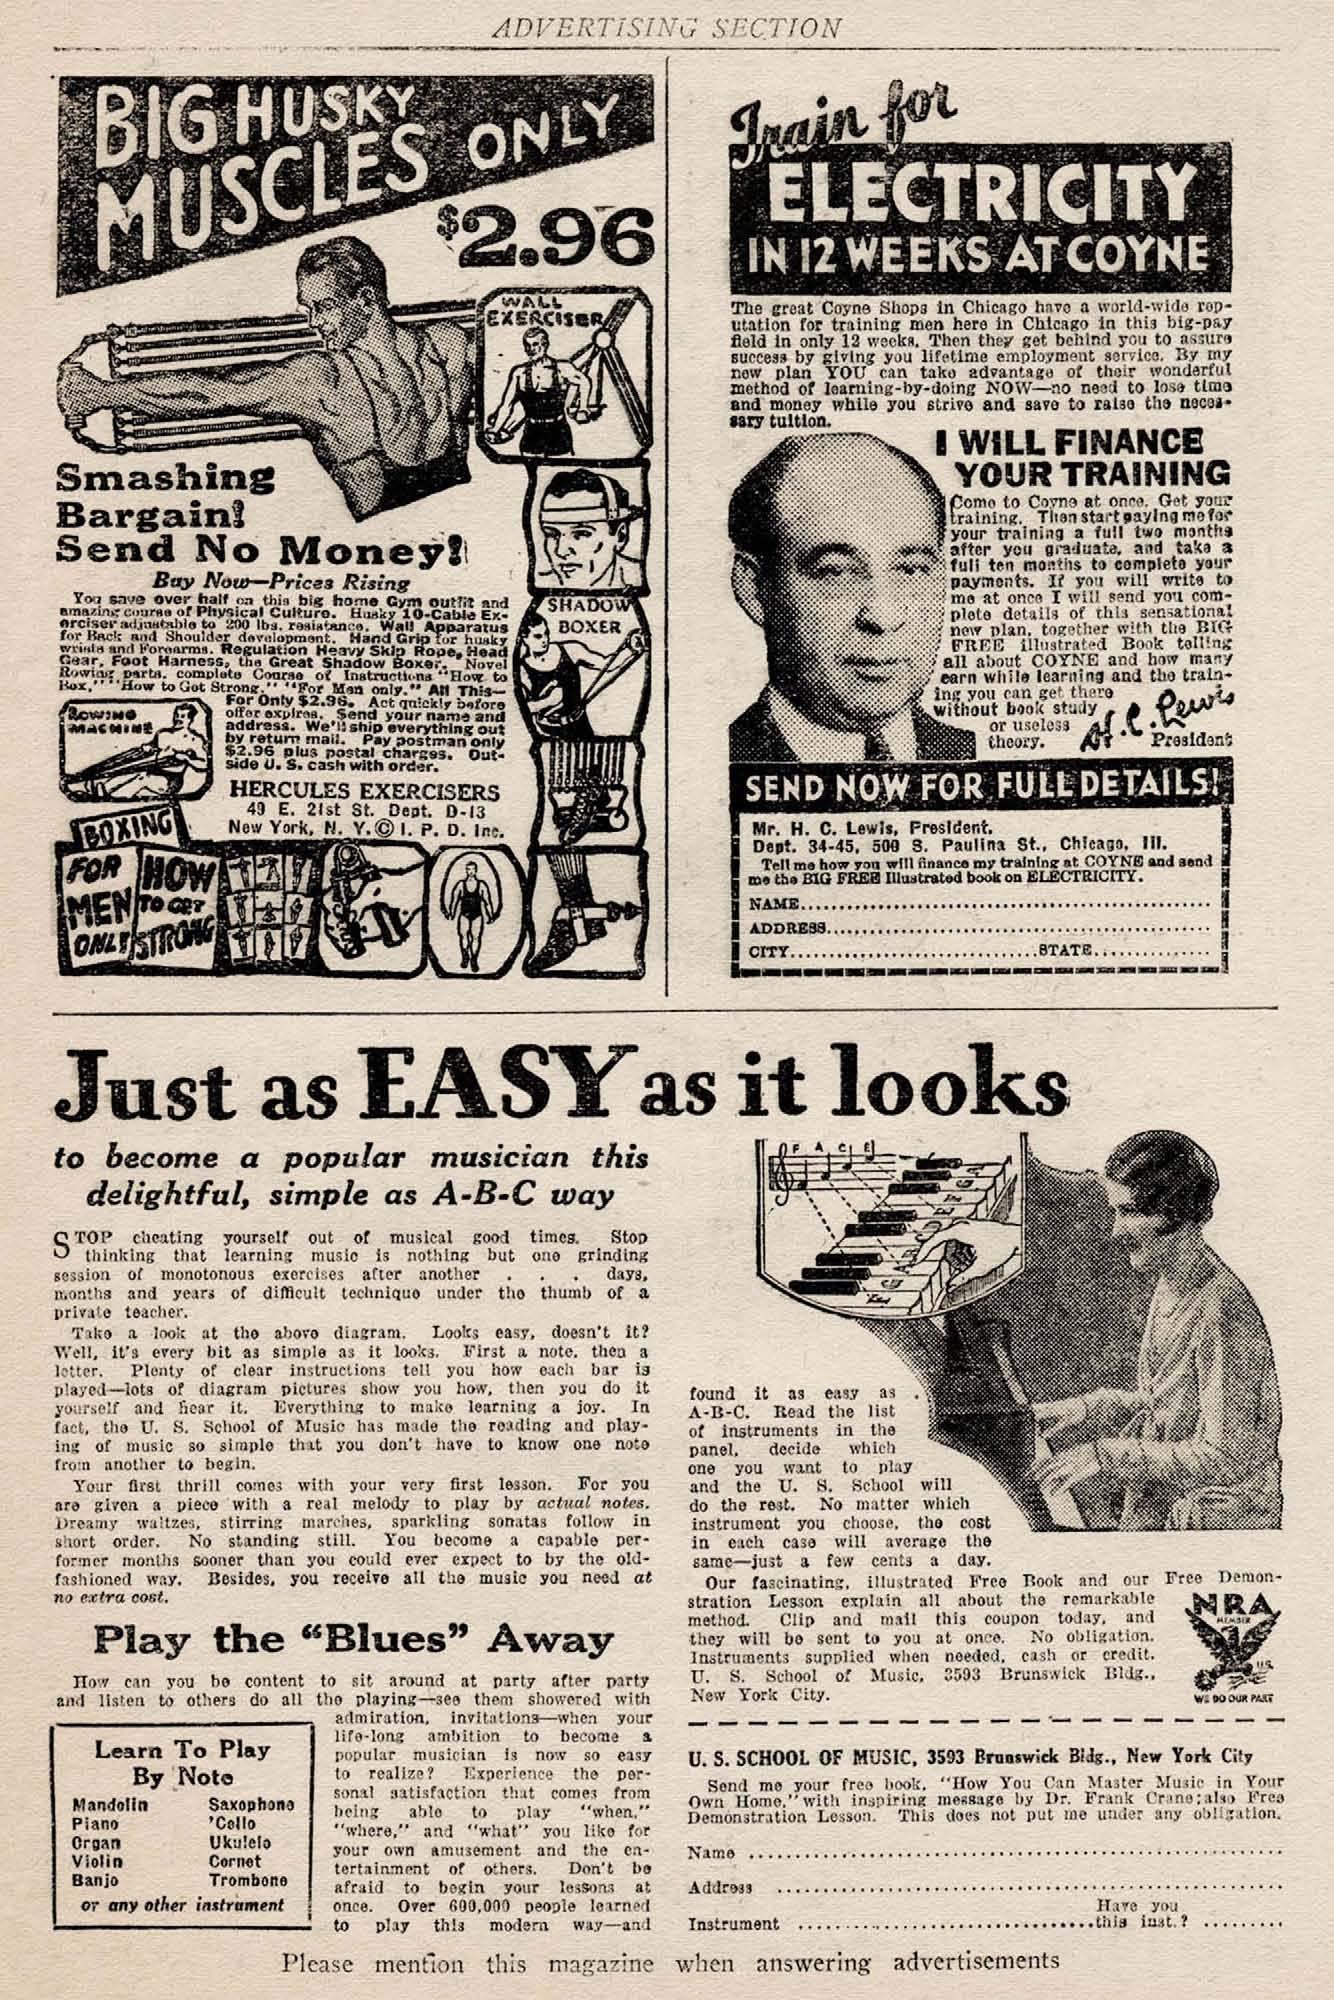 Love Story Magazine Vol  CV, No  5 (March 10, 1934), ed  by